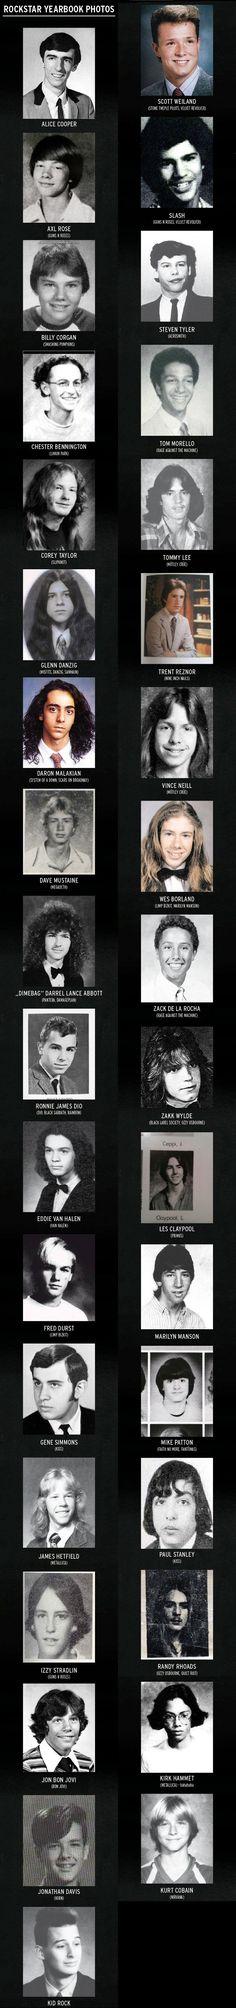 Rockstar Yearbook Photos, did Paul Stanley EVER have bad eyebrows?